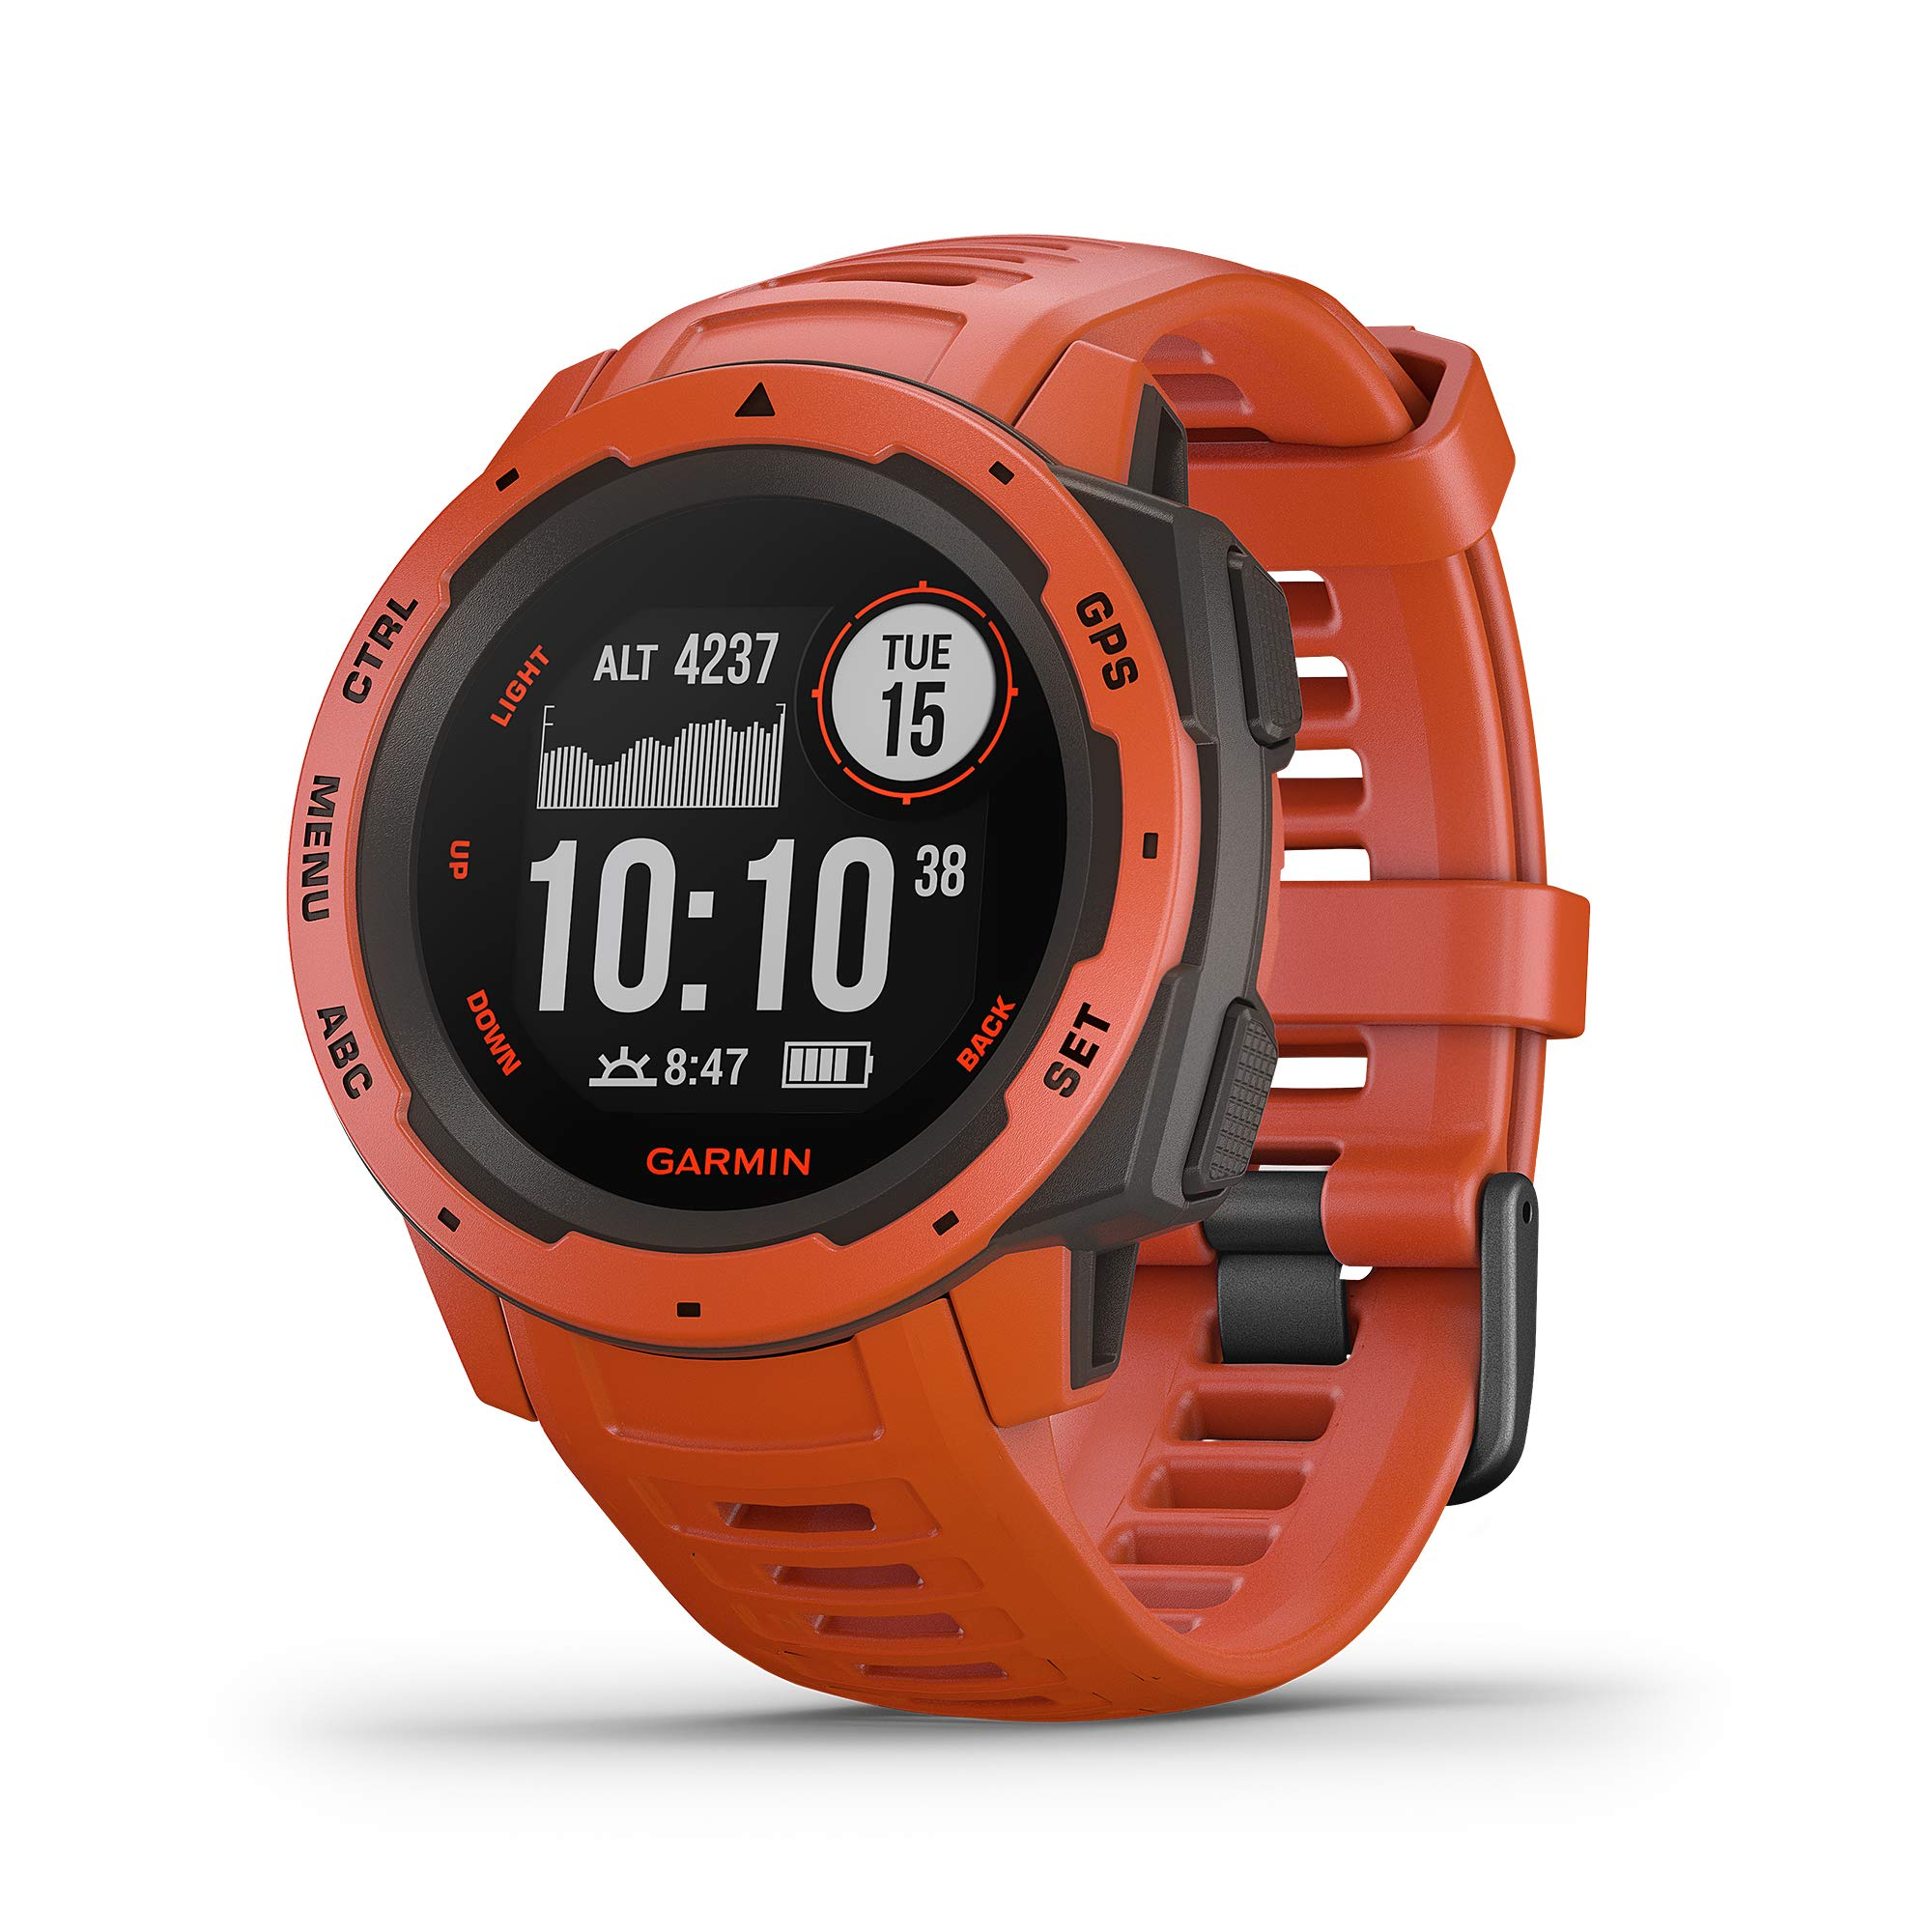 Garmin Instinct,坚固的户外手表带 GPS,具有 GLONASS 和伽利略,心率监控和 3 轴指南针010-02064-02 1.27 inches 火焰红